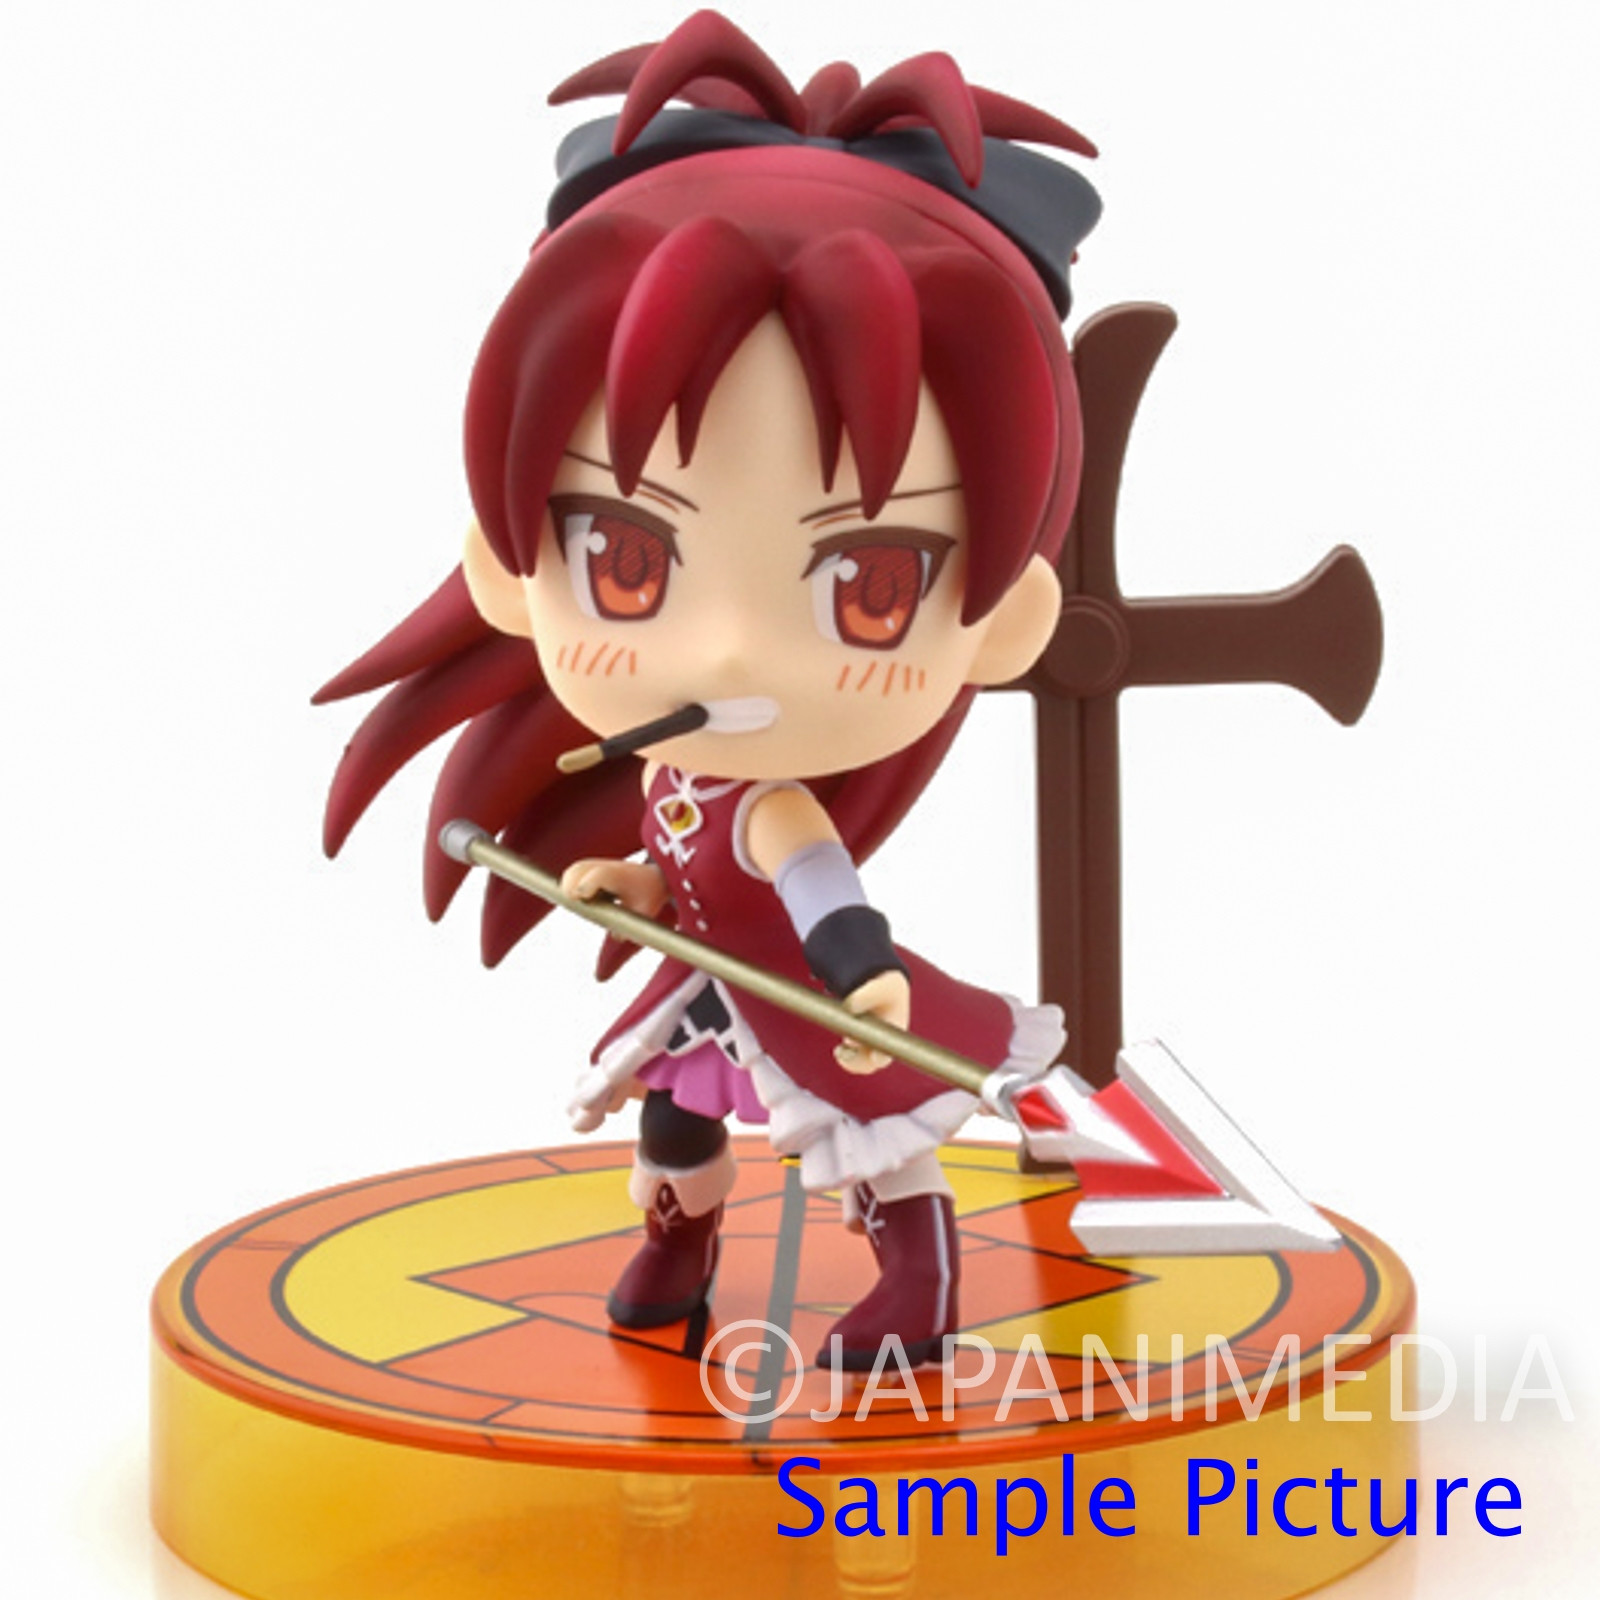 Puella Magi Madoka Magica Kyoko Sakura Kyun Chara Figure JAPAN ANIME